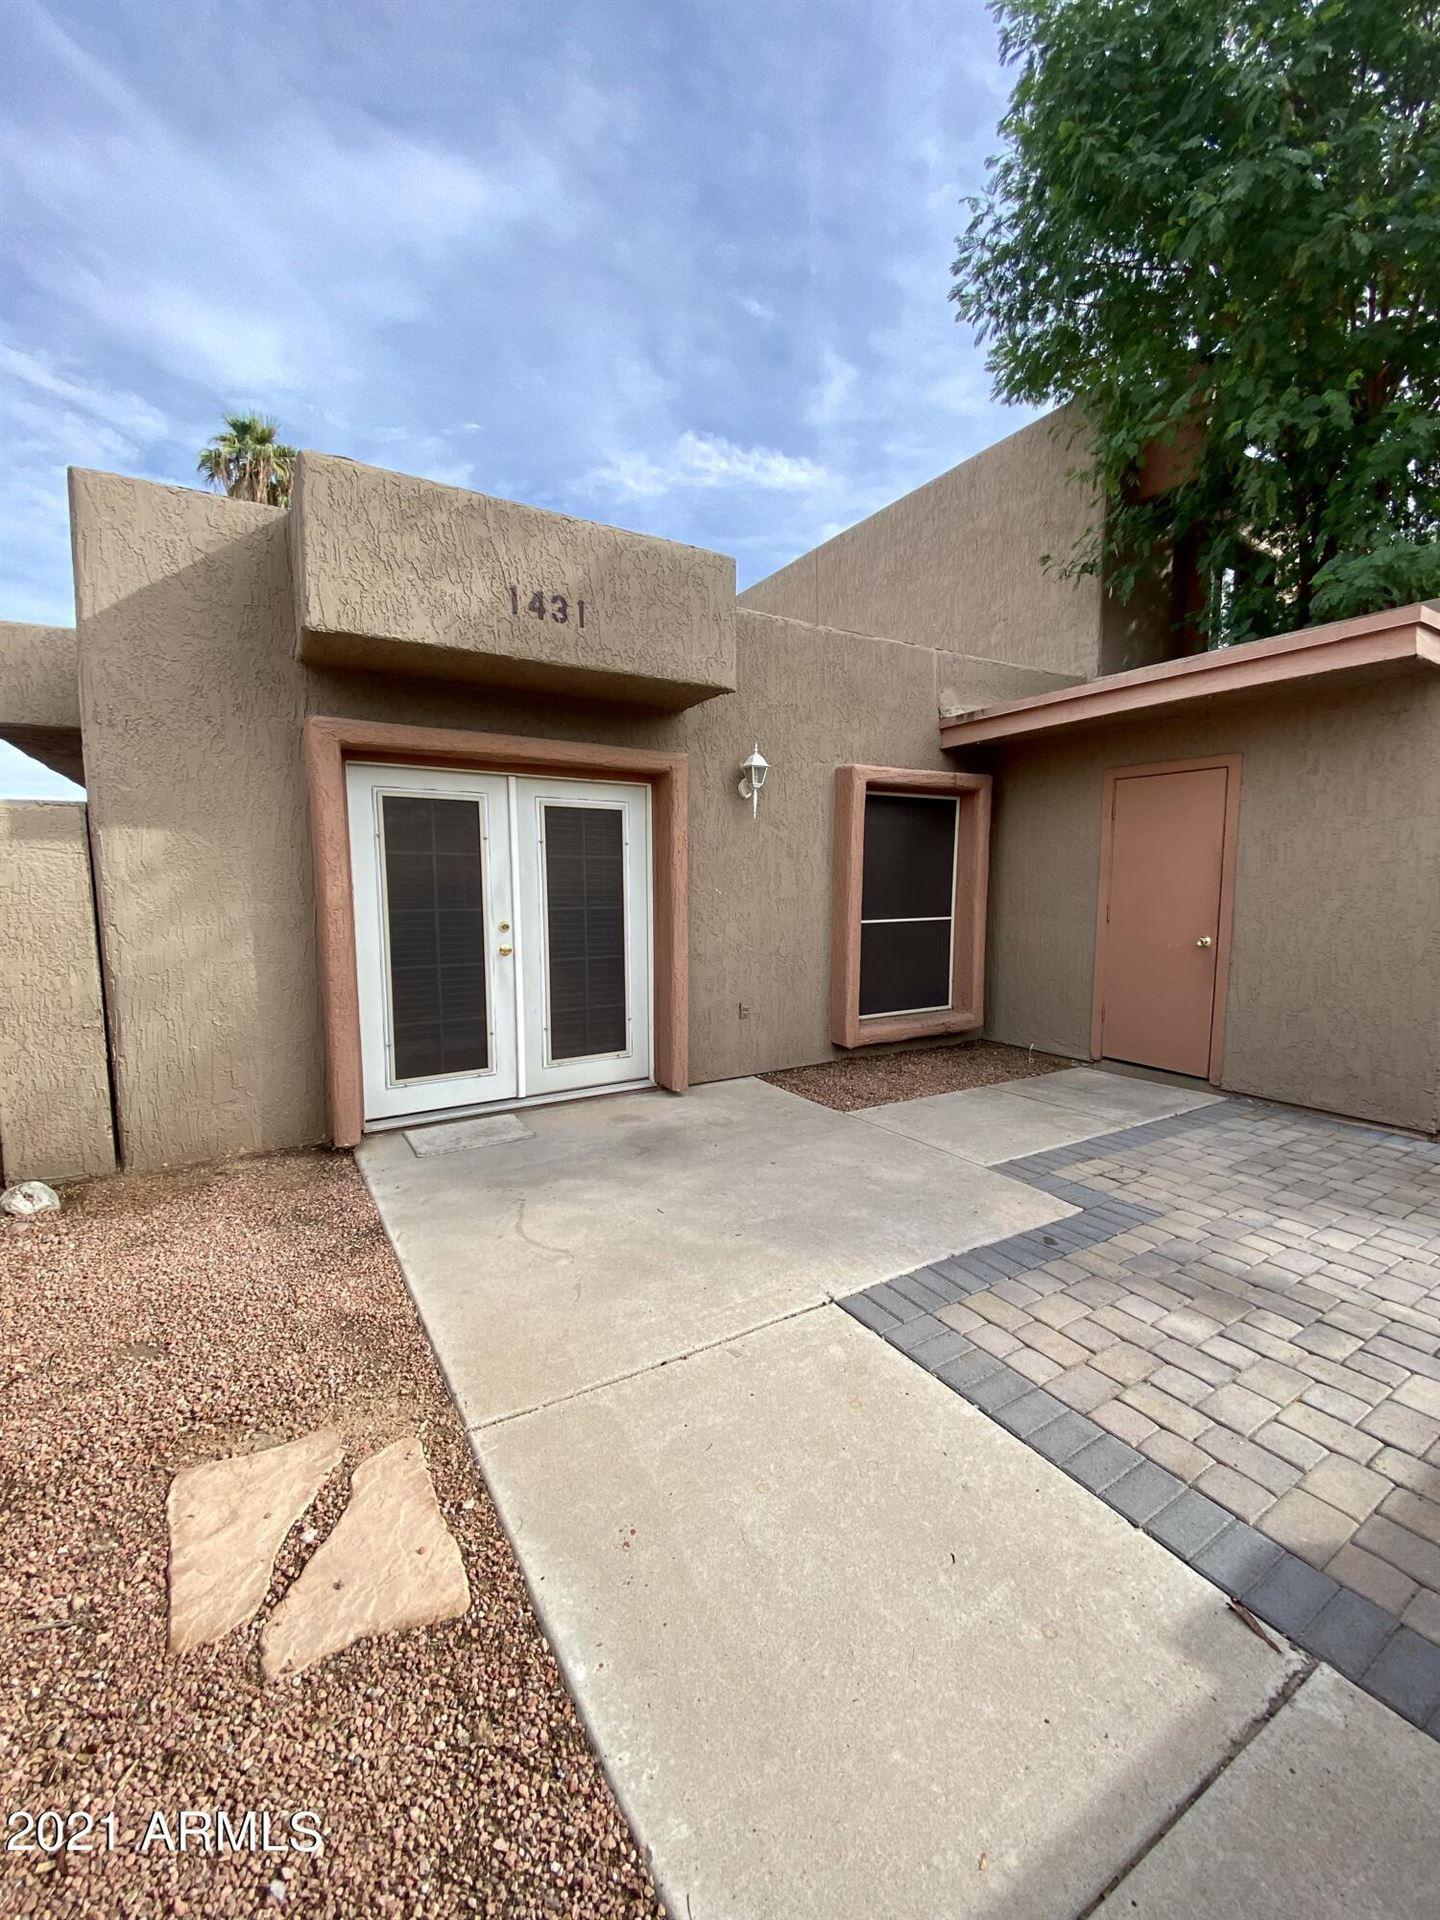 Photo of 1431 N 54TH Avenue, Phoenix, AZ 85043 (MLS # 6307865)